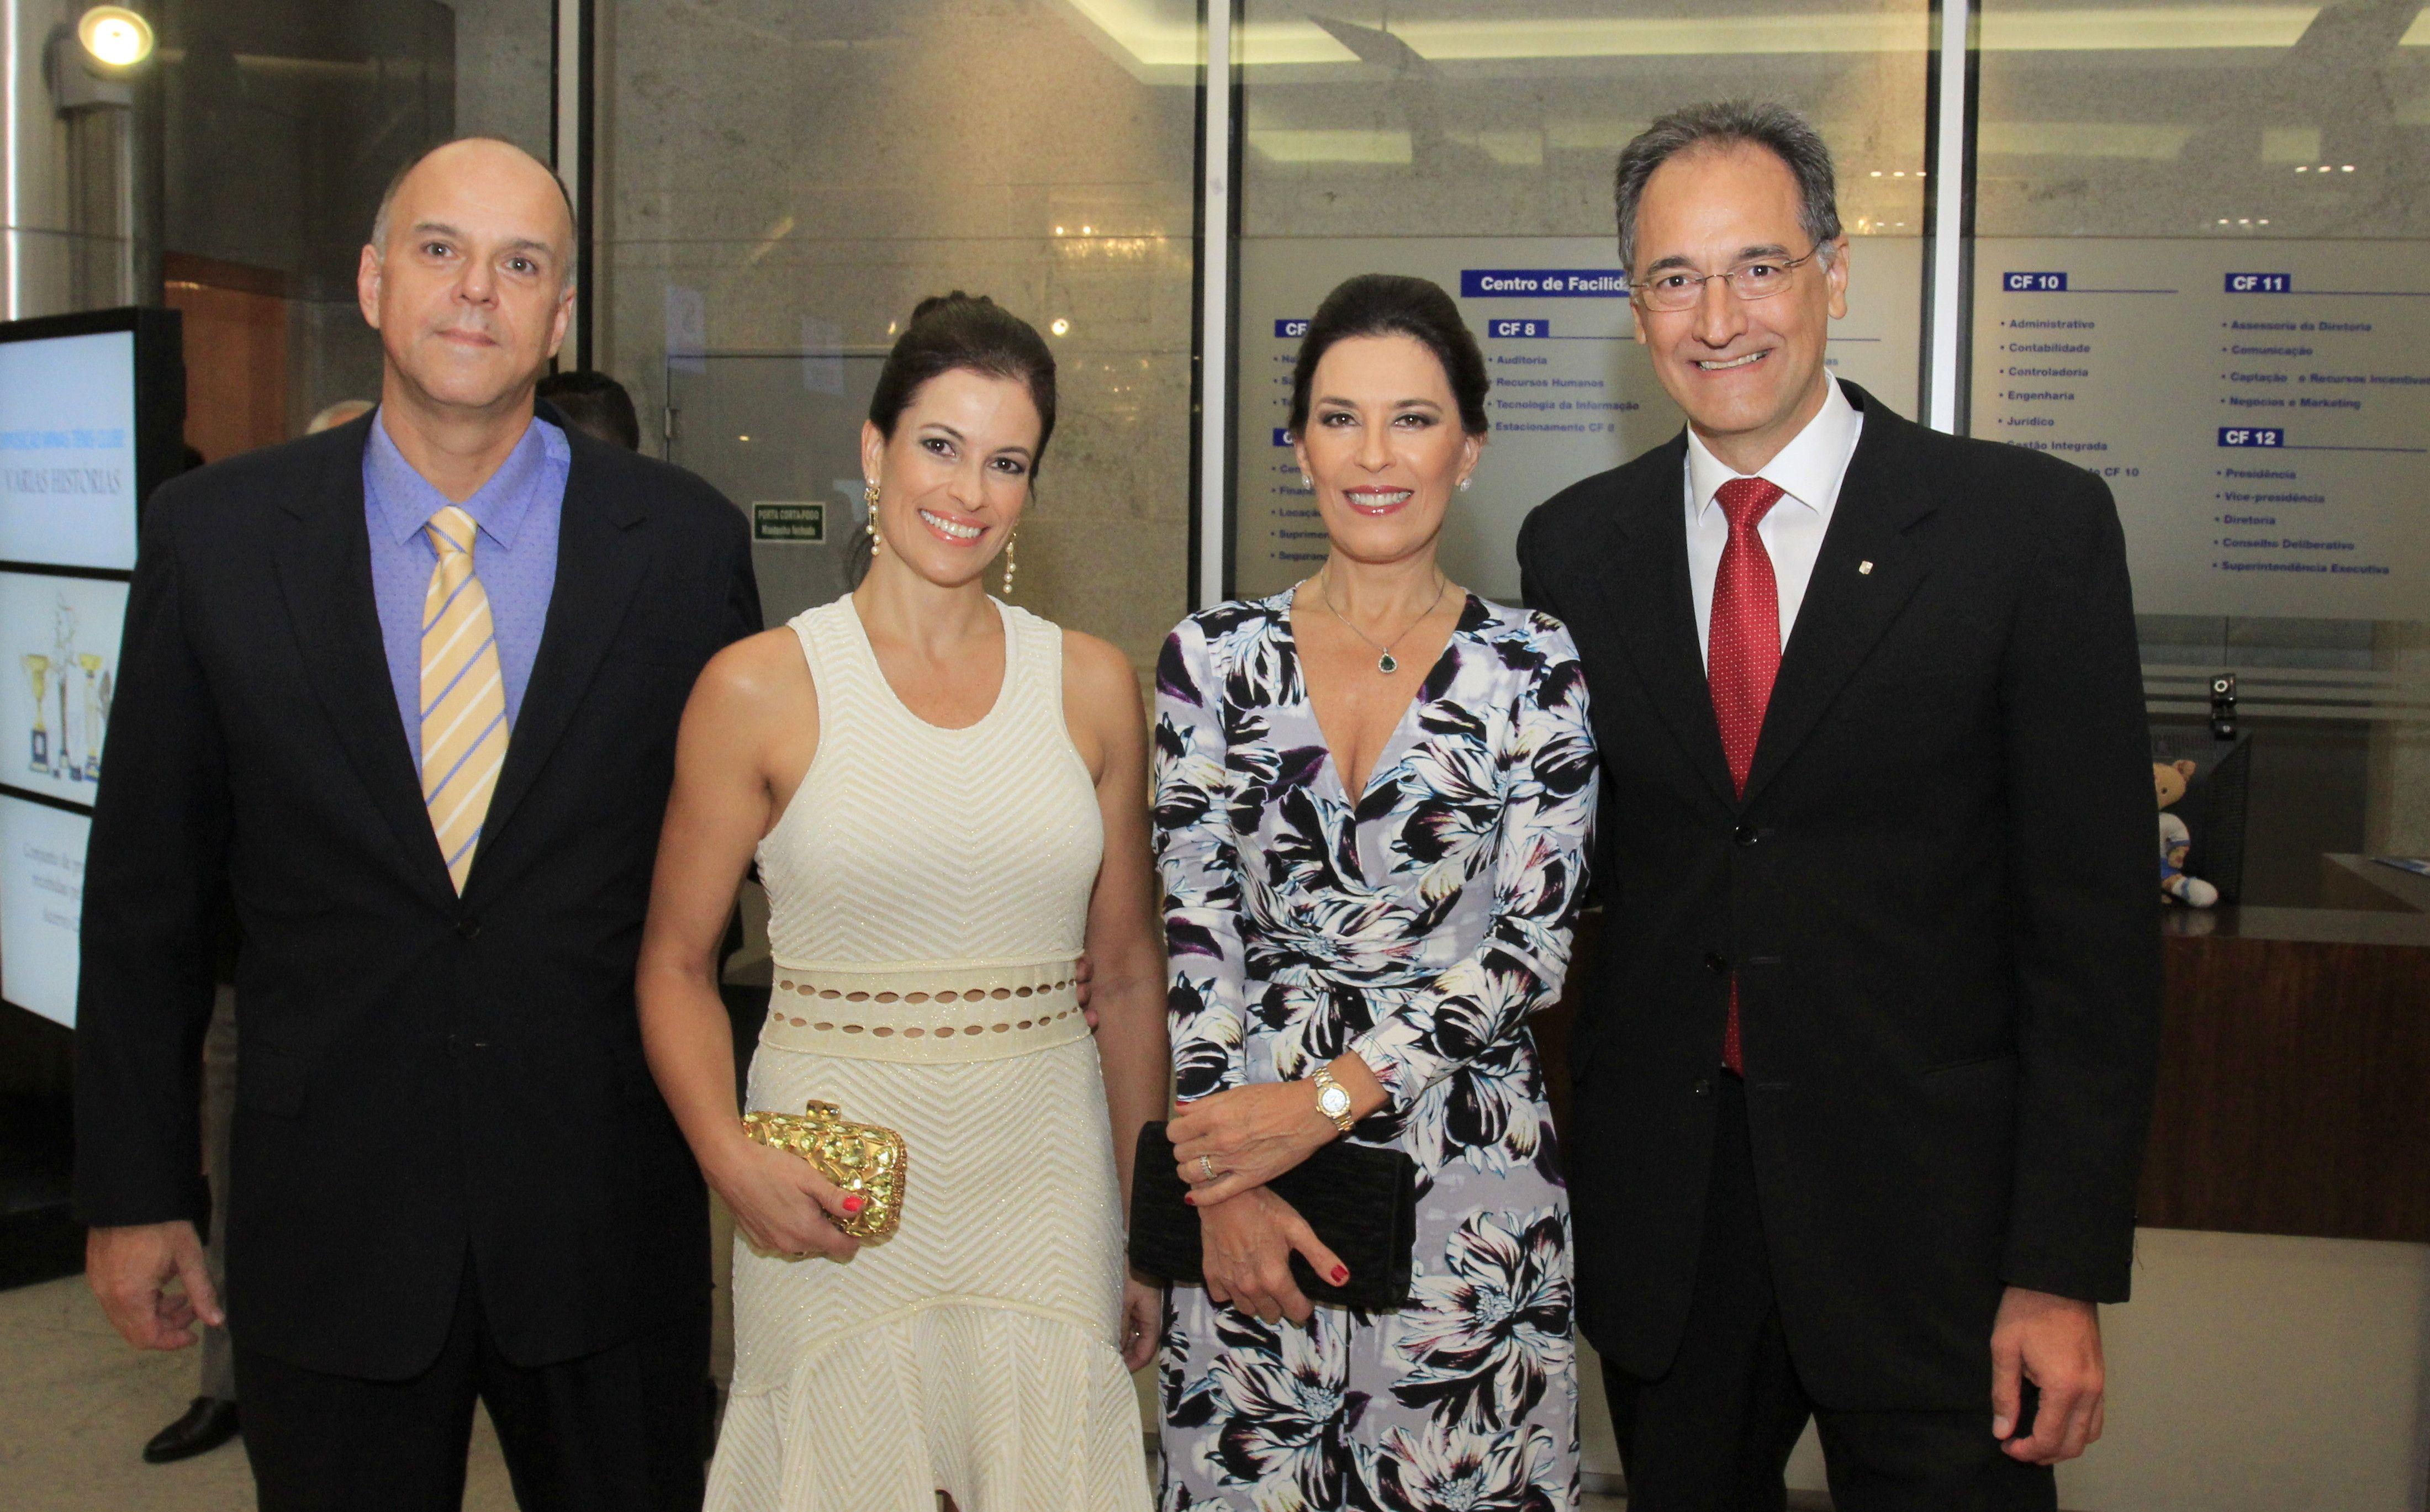 Paulo Emilio e Carolina Carreiro, Patricia e Gustavo Lage